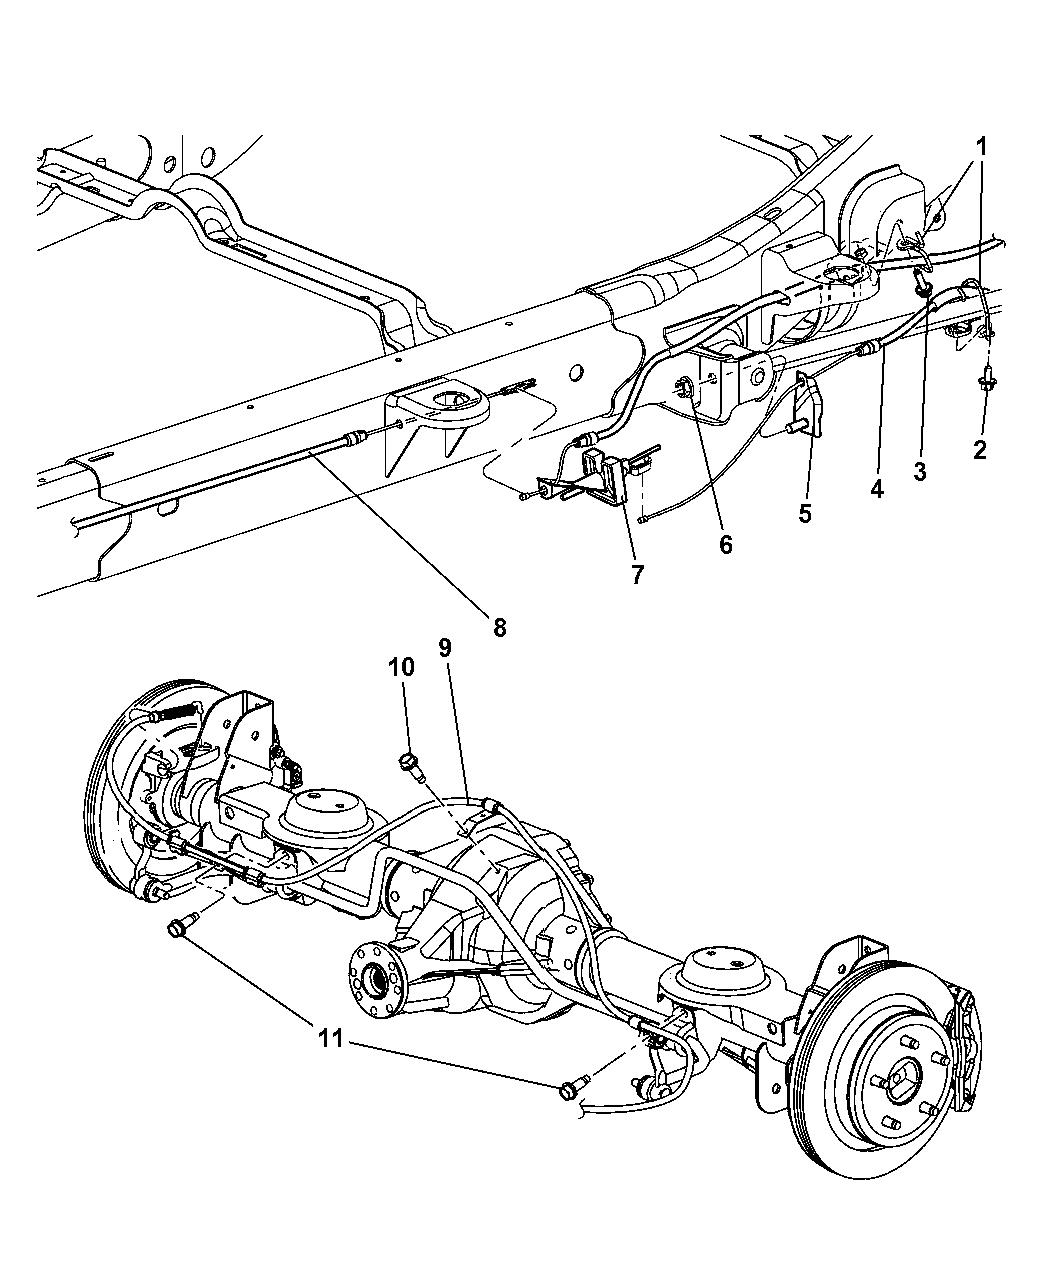 Dodge Durango Parking Brake Cable